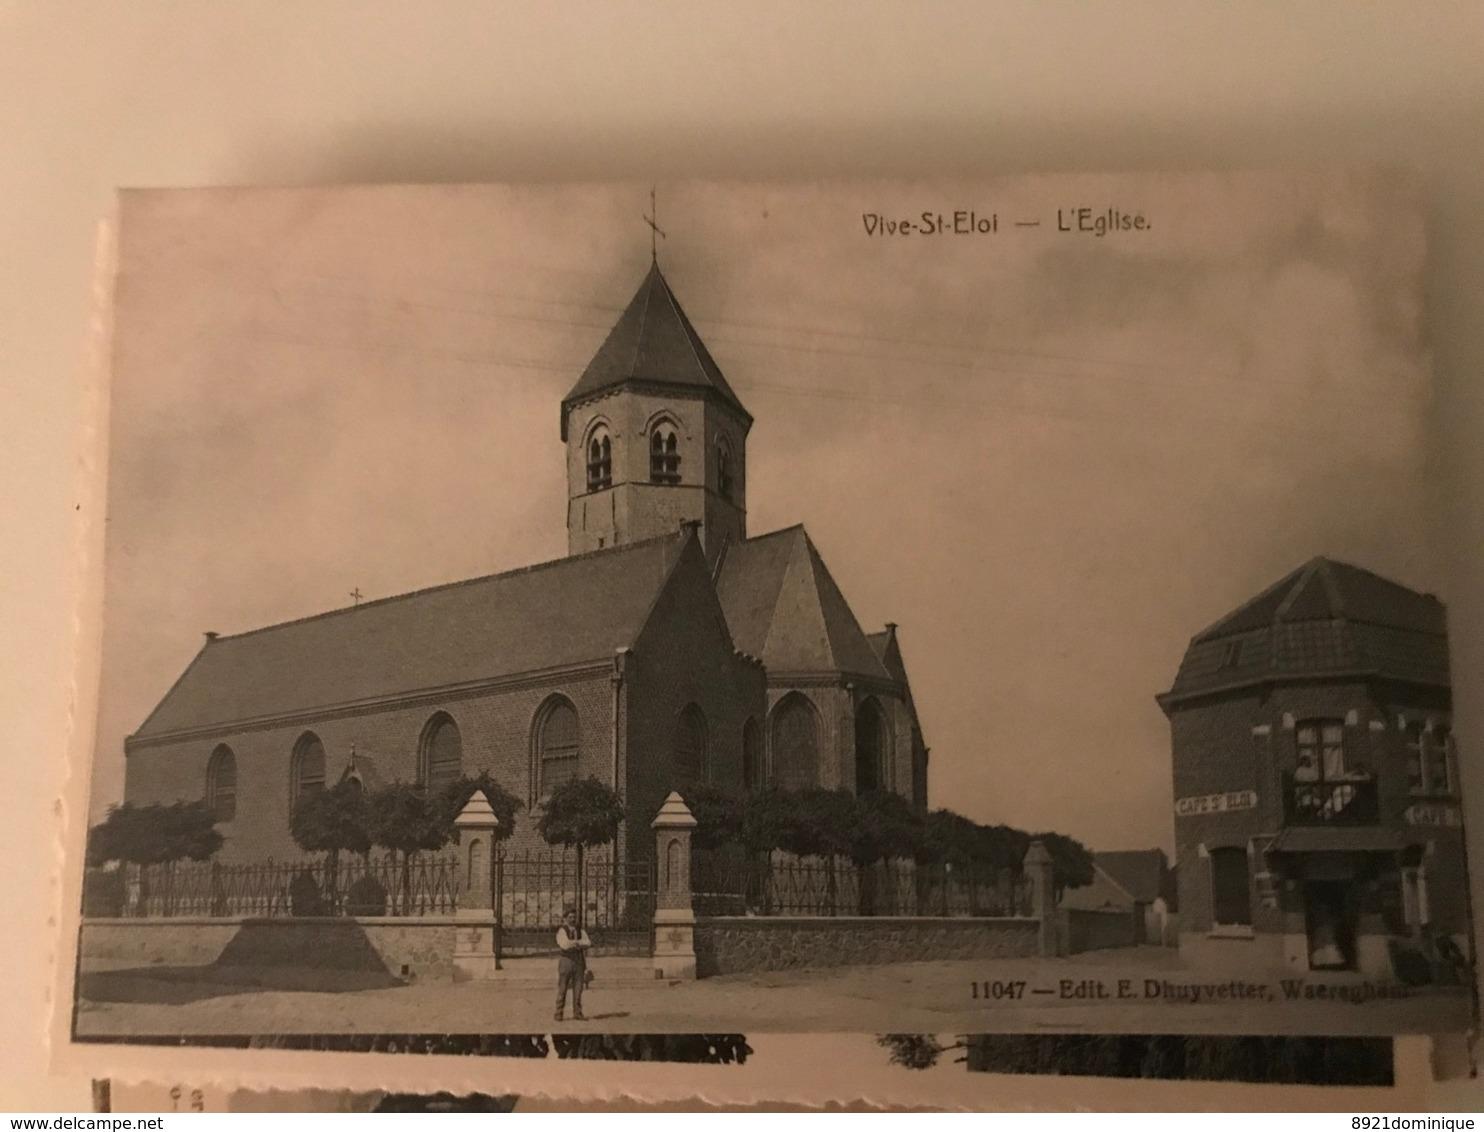 Sint - Eloois - Vijve Vive St Eloi L' église Edit Dhuyvetter Waereghem - Waregem